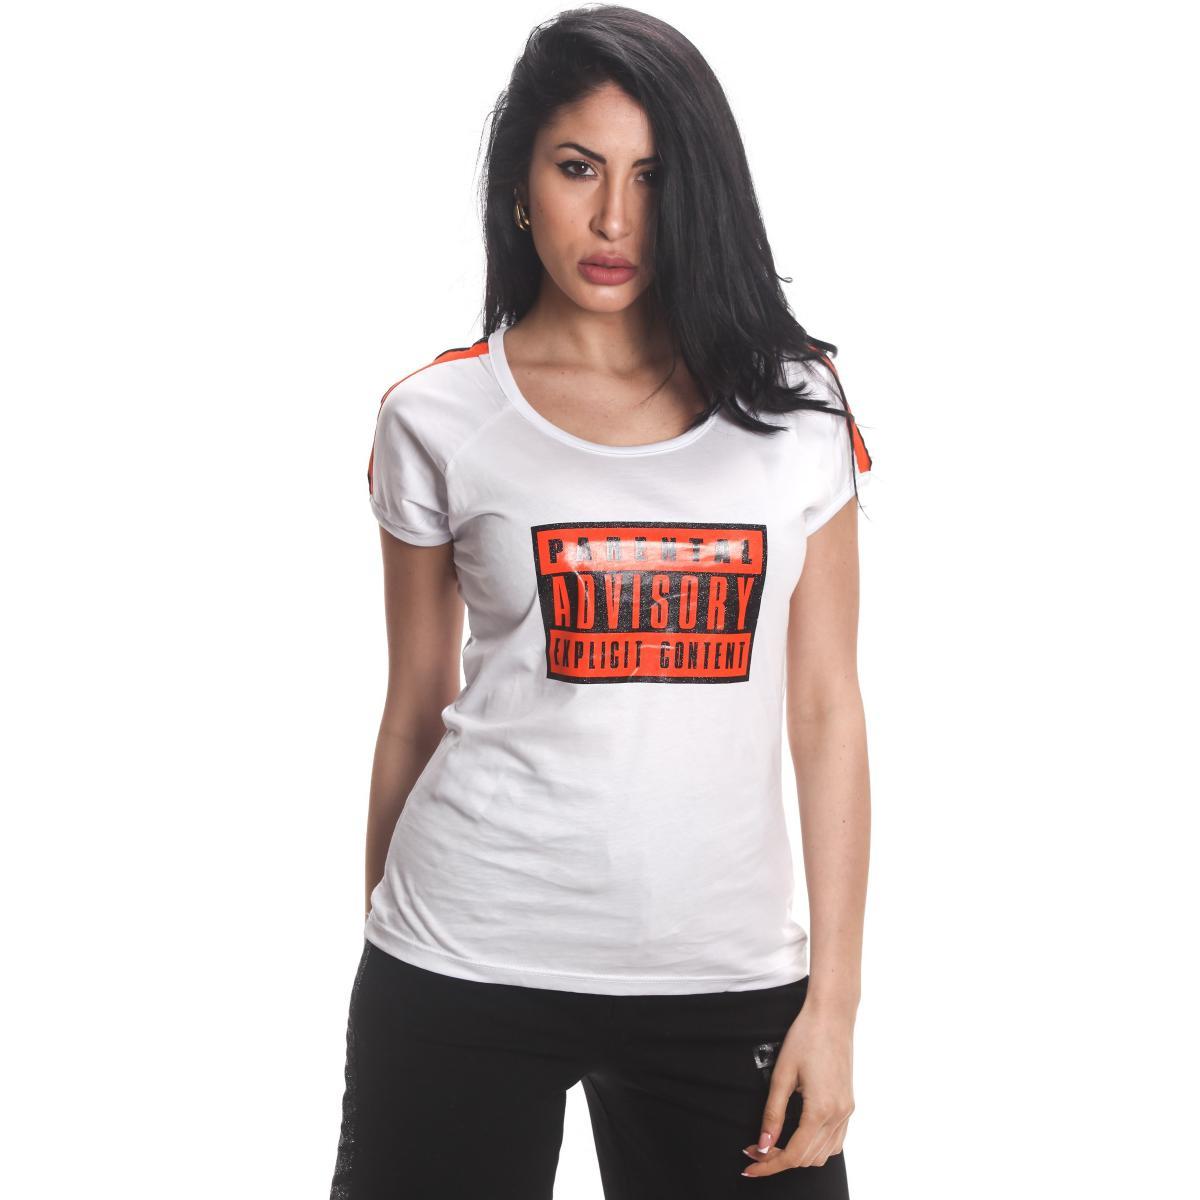 T-shirt Parental Advisory con scollo tondo e stampa logo da donna rif. AD228D